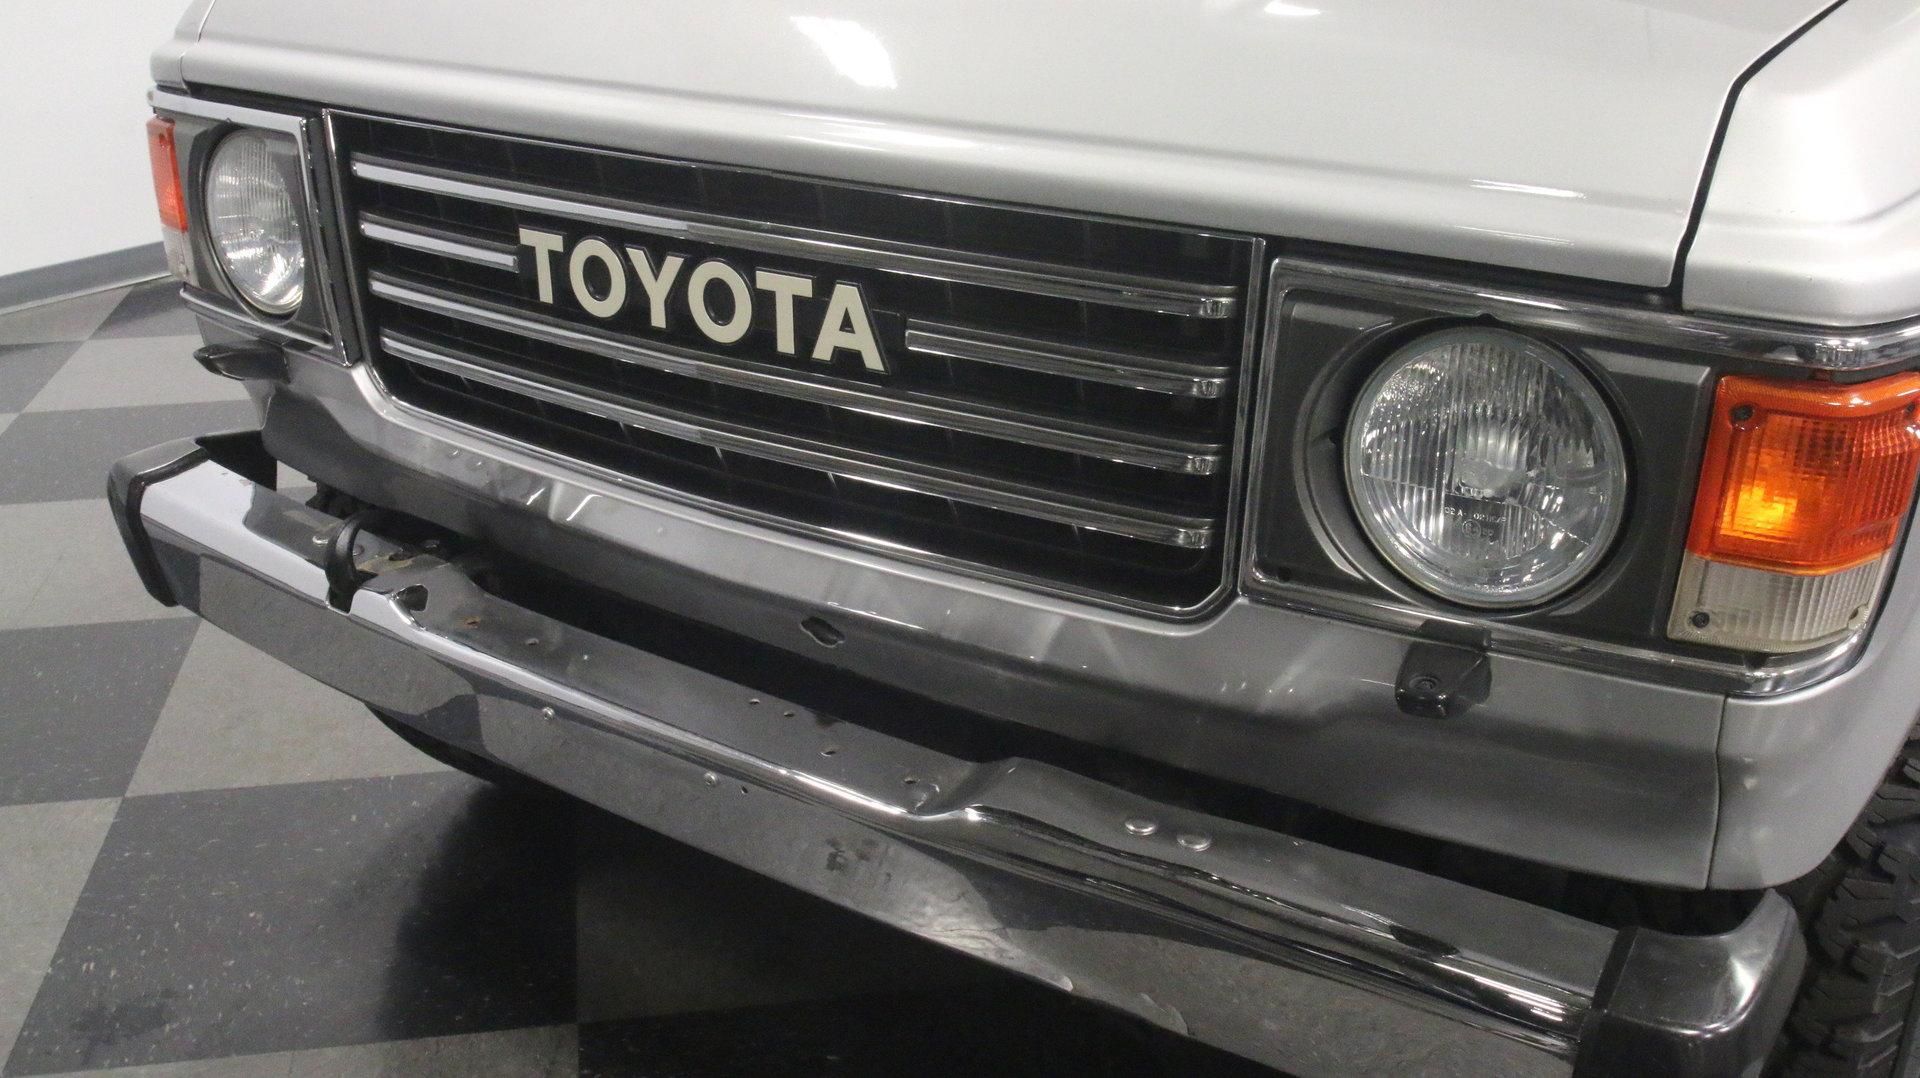 1987 Toyota Land Cruiser Streetside Classics The Nations Fj60 View 360